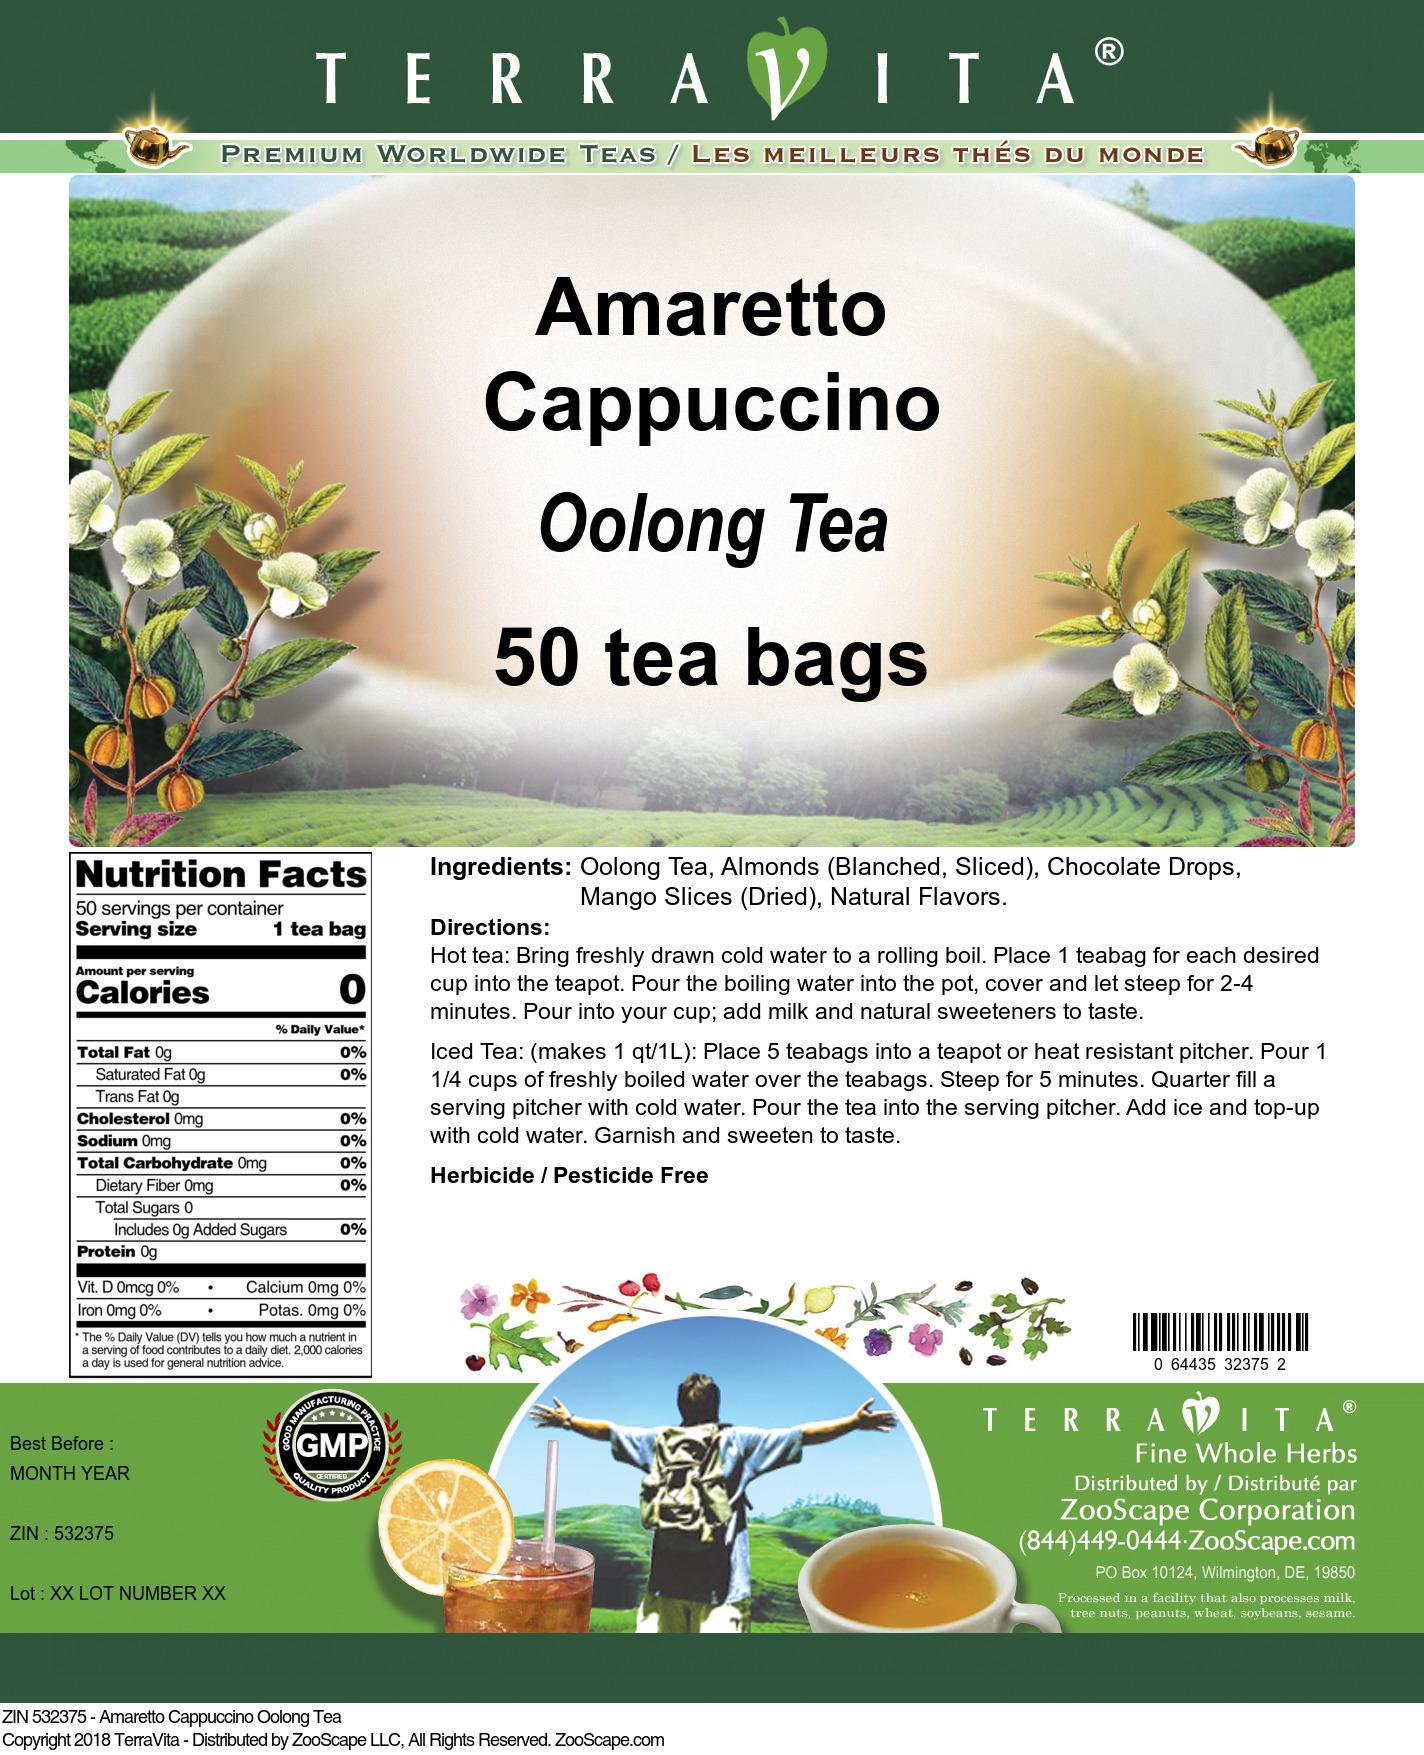 Amaretto Cappuccino Oolong Tea